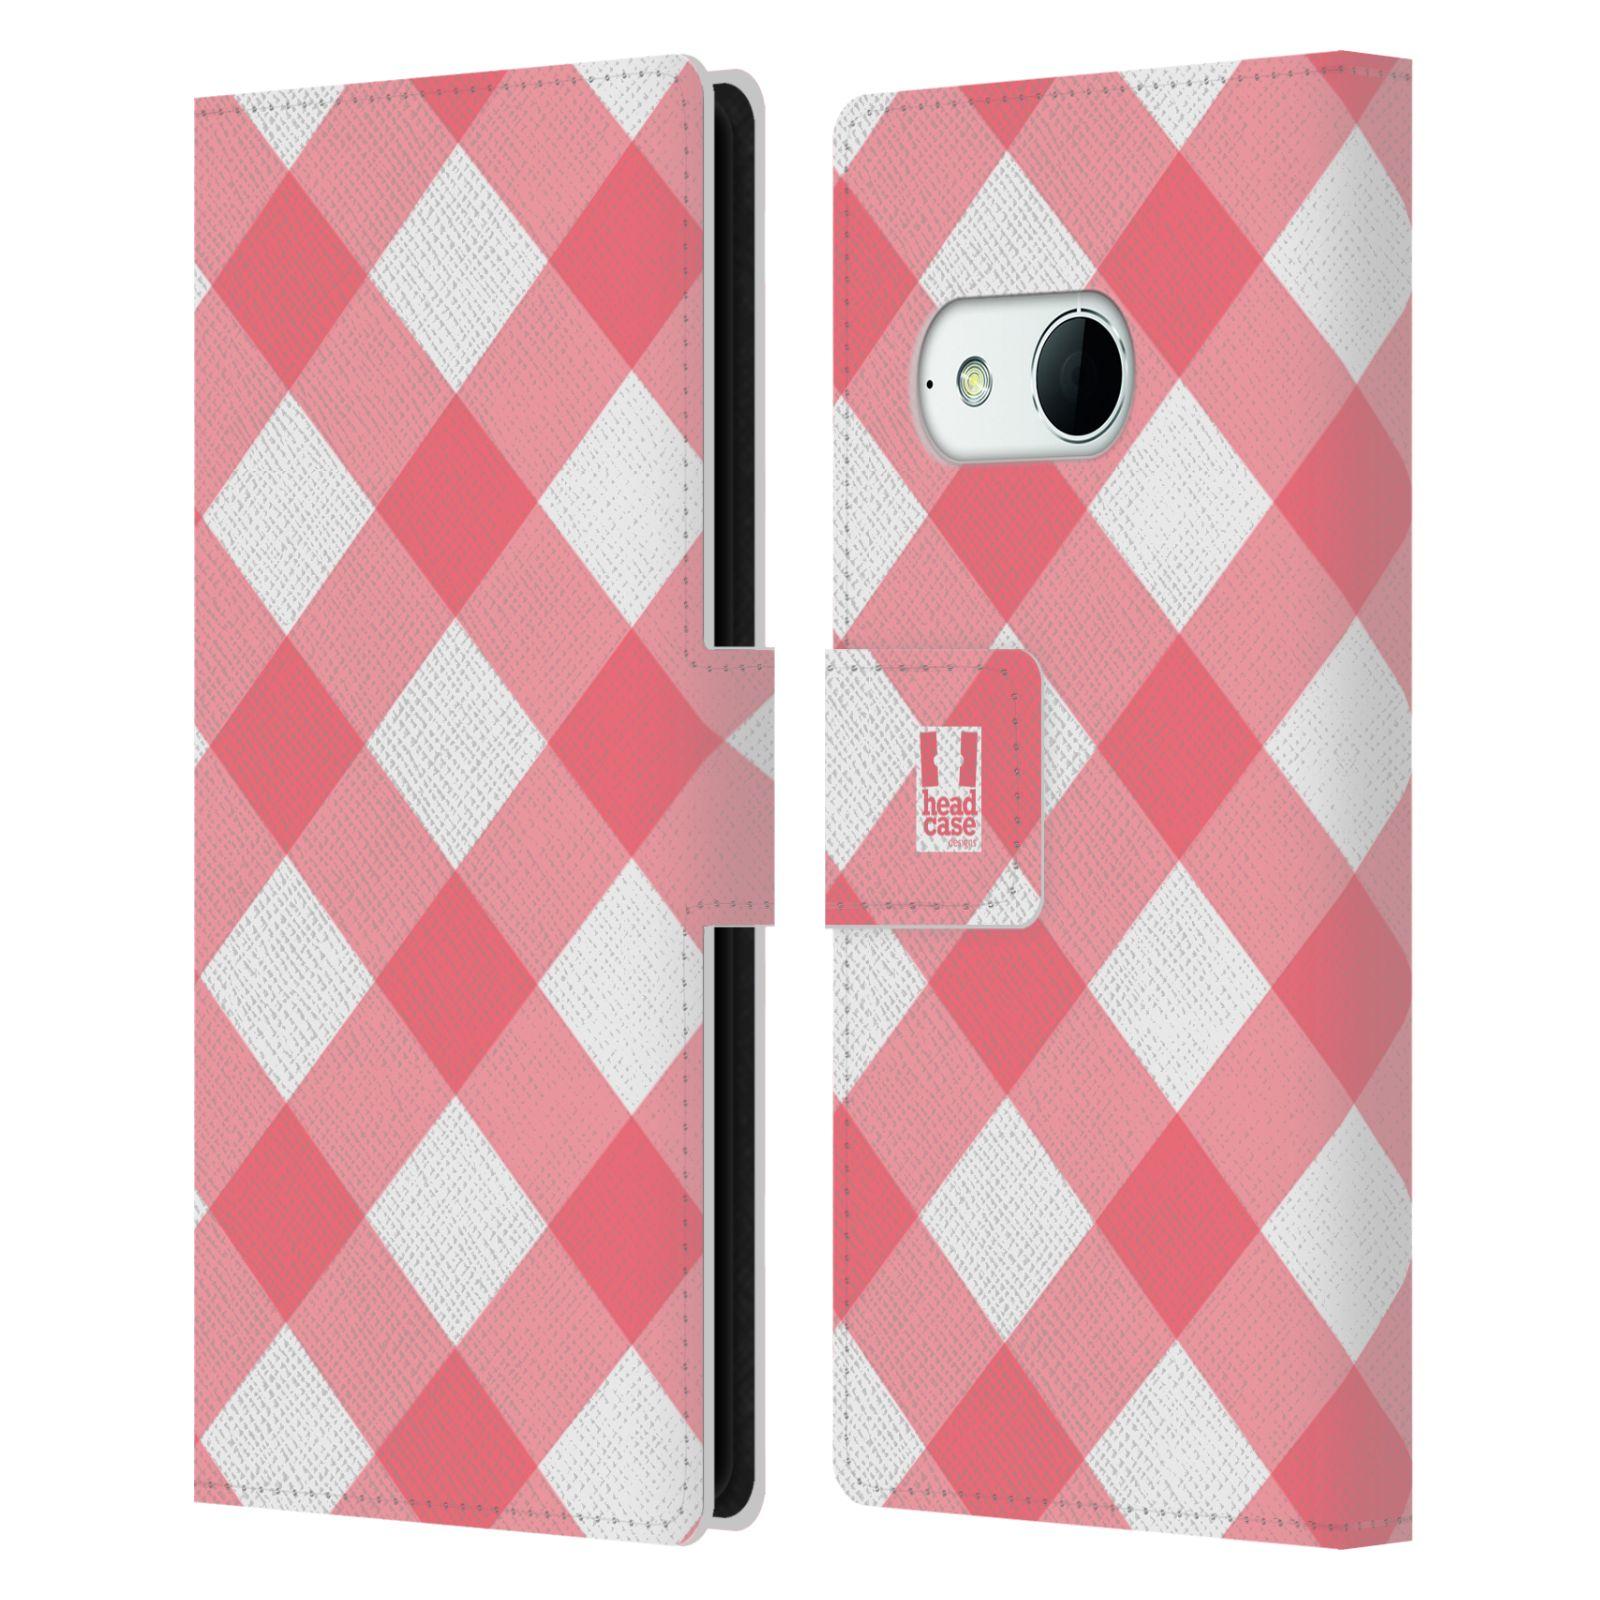 HEAD CASE Flipové pouzdro pro mobil HTC ONE MINI 2 (M8) Francouzský venkov piknik růžová